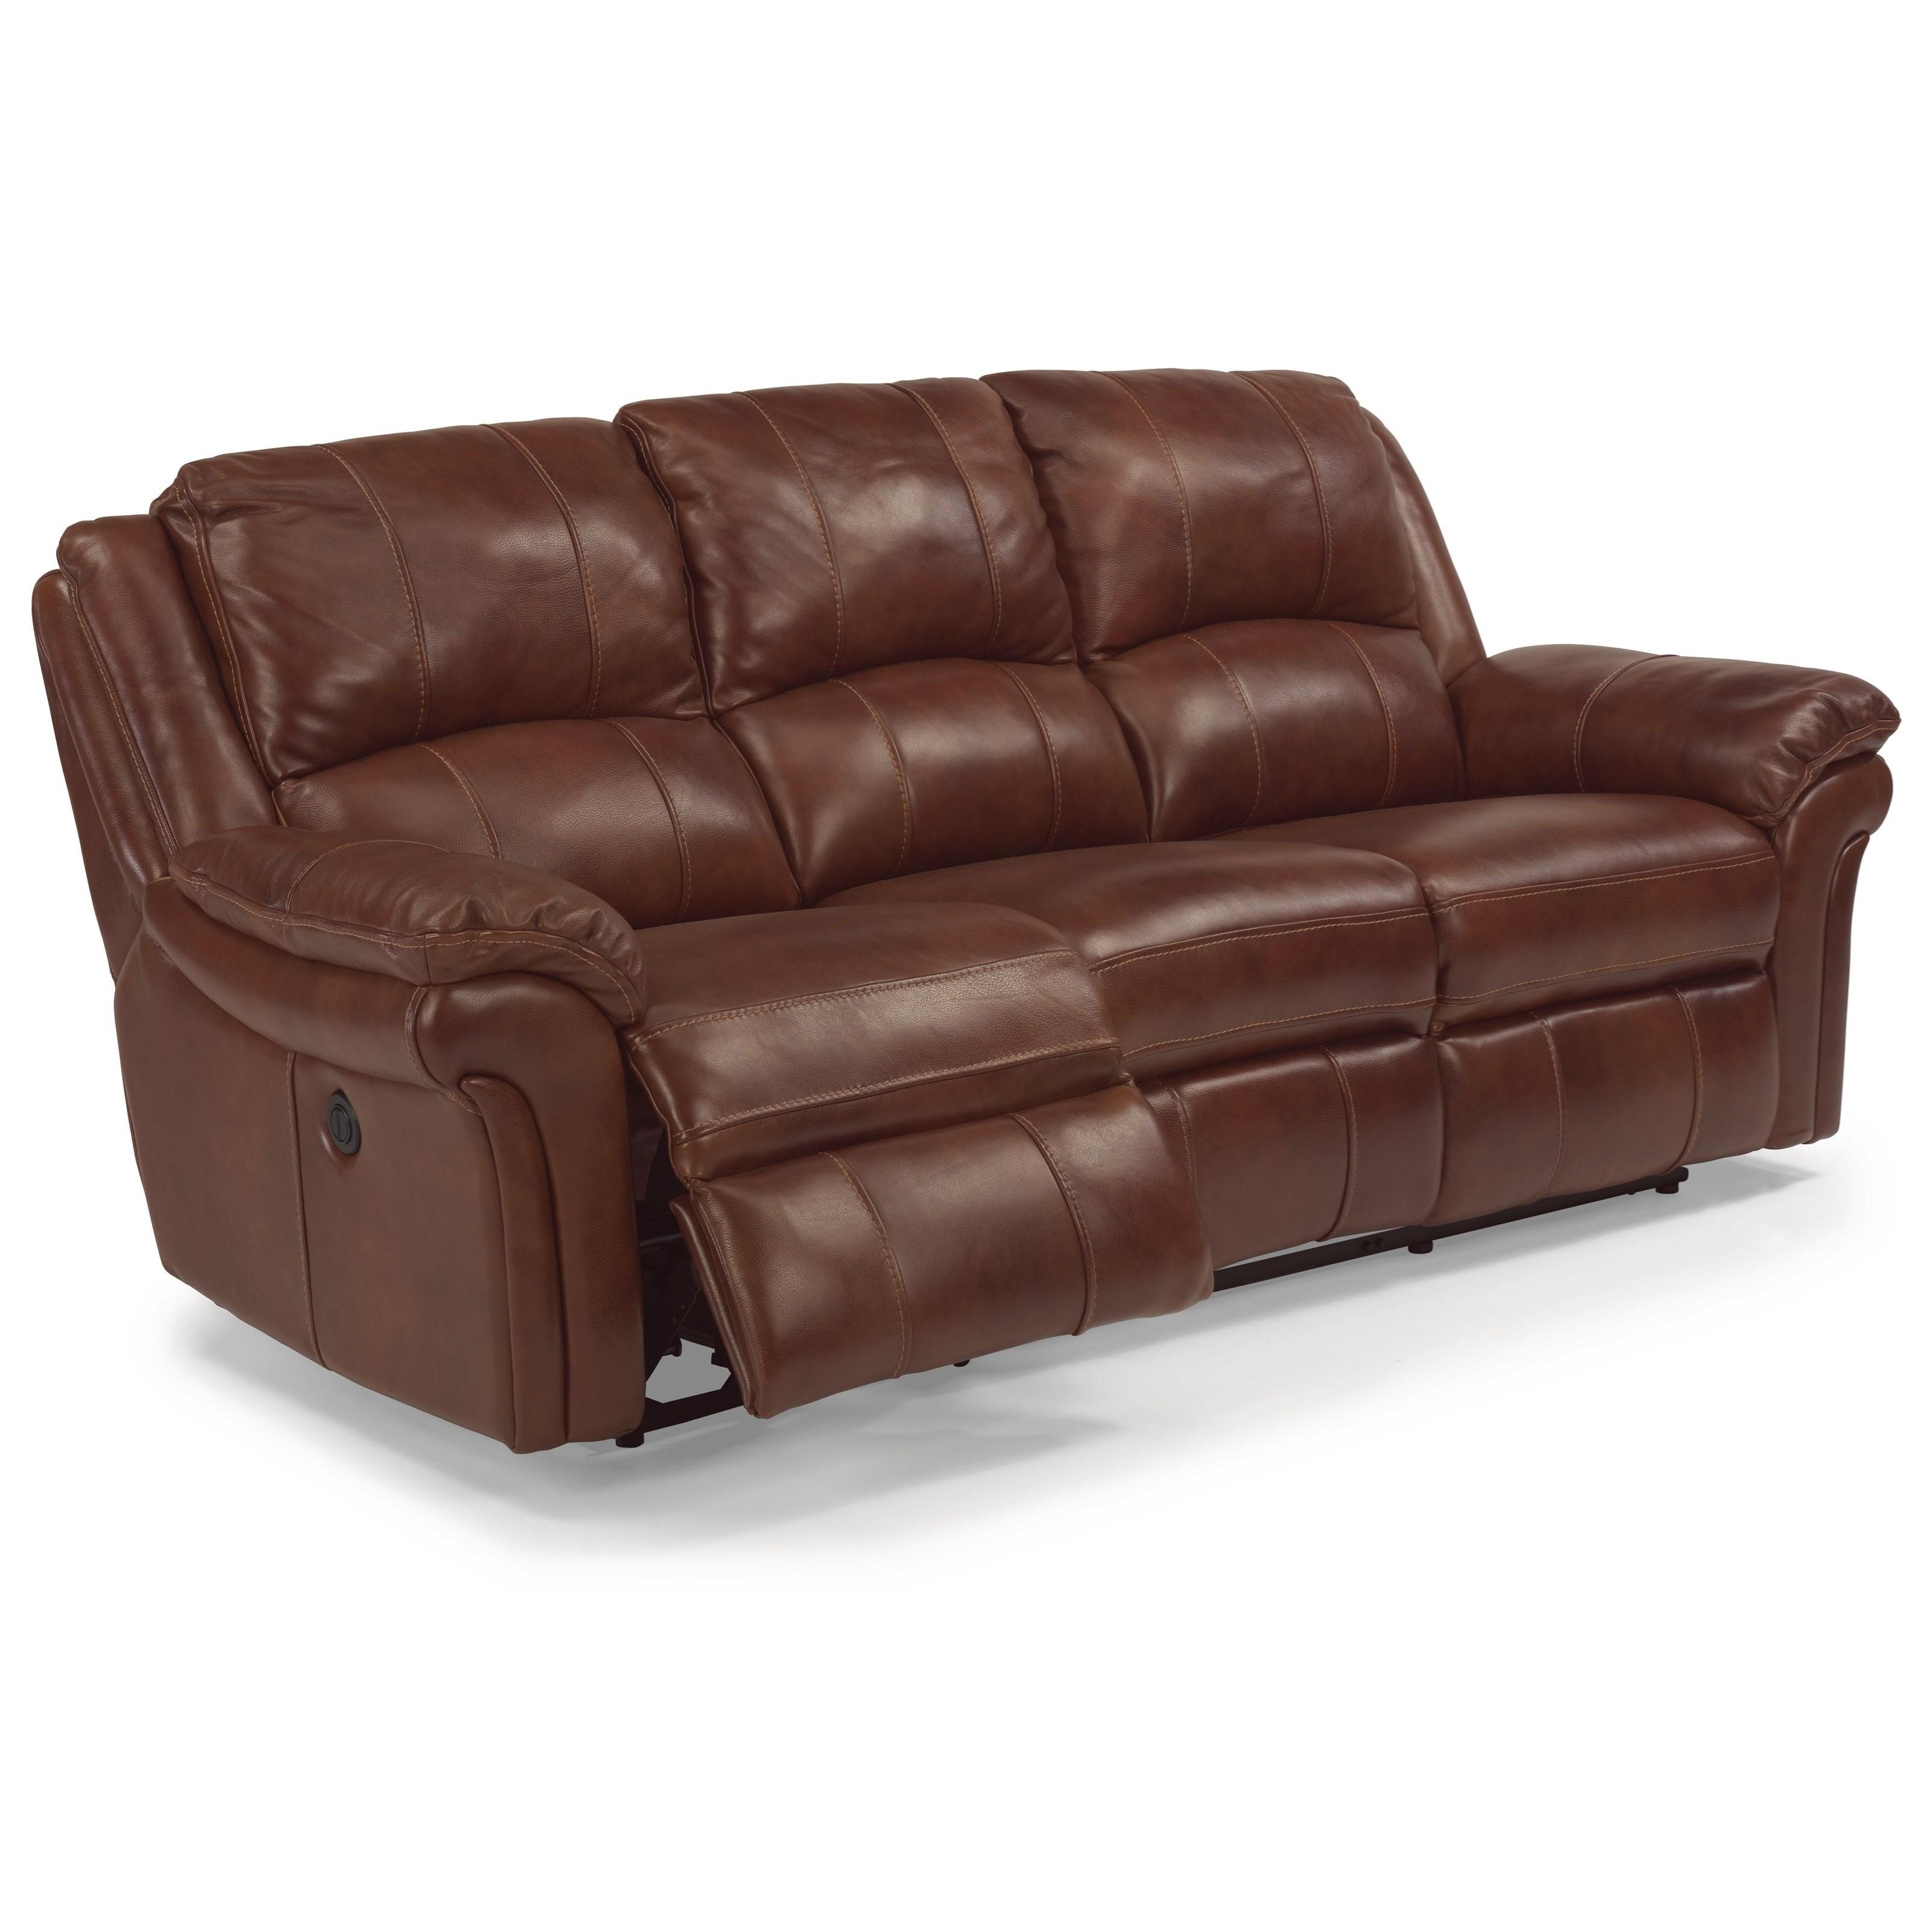 Flexsteel latitudes dandridge casual power reclining for Casual couch